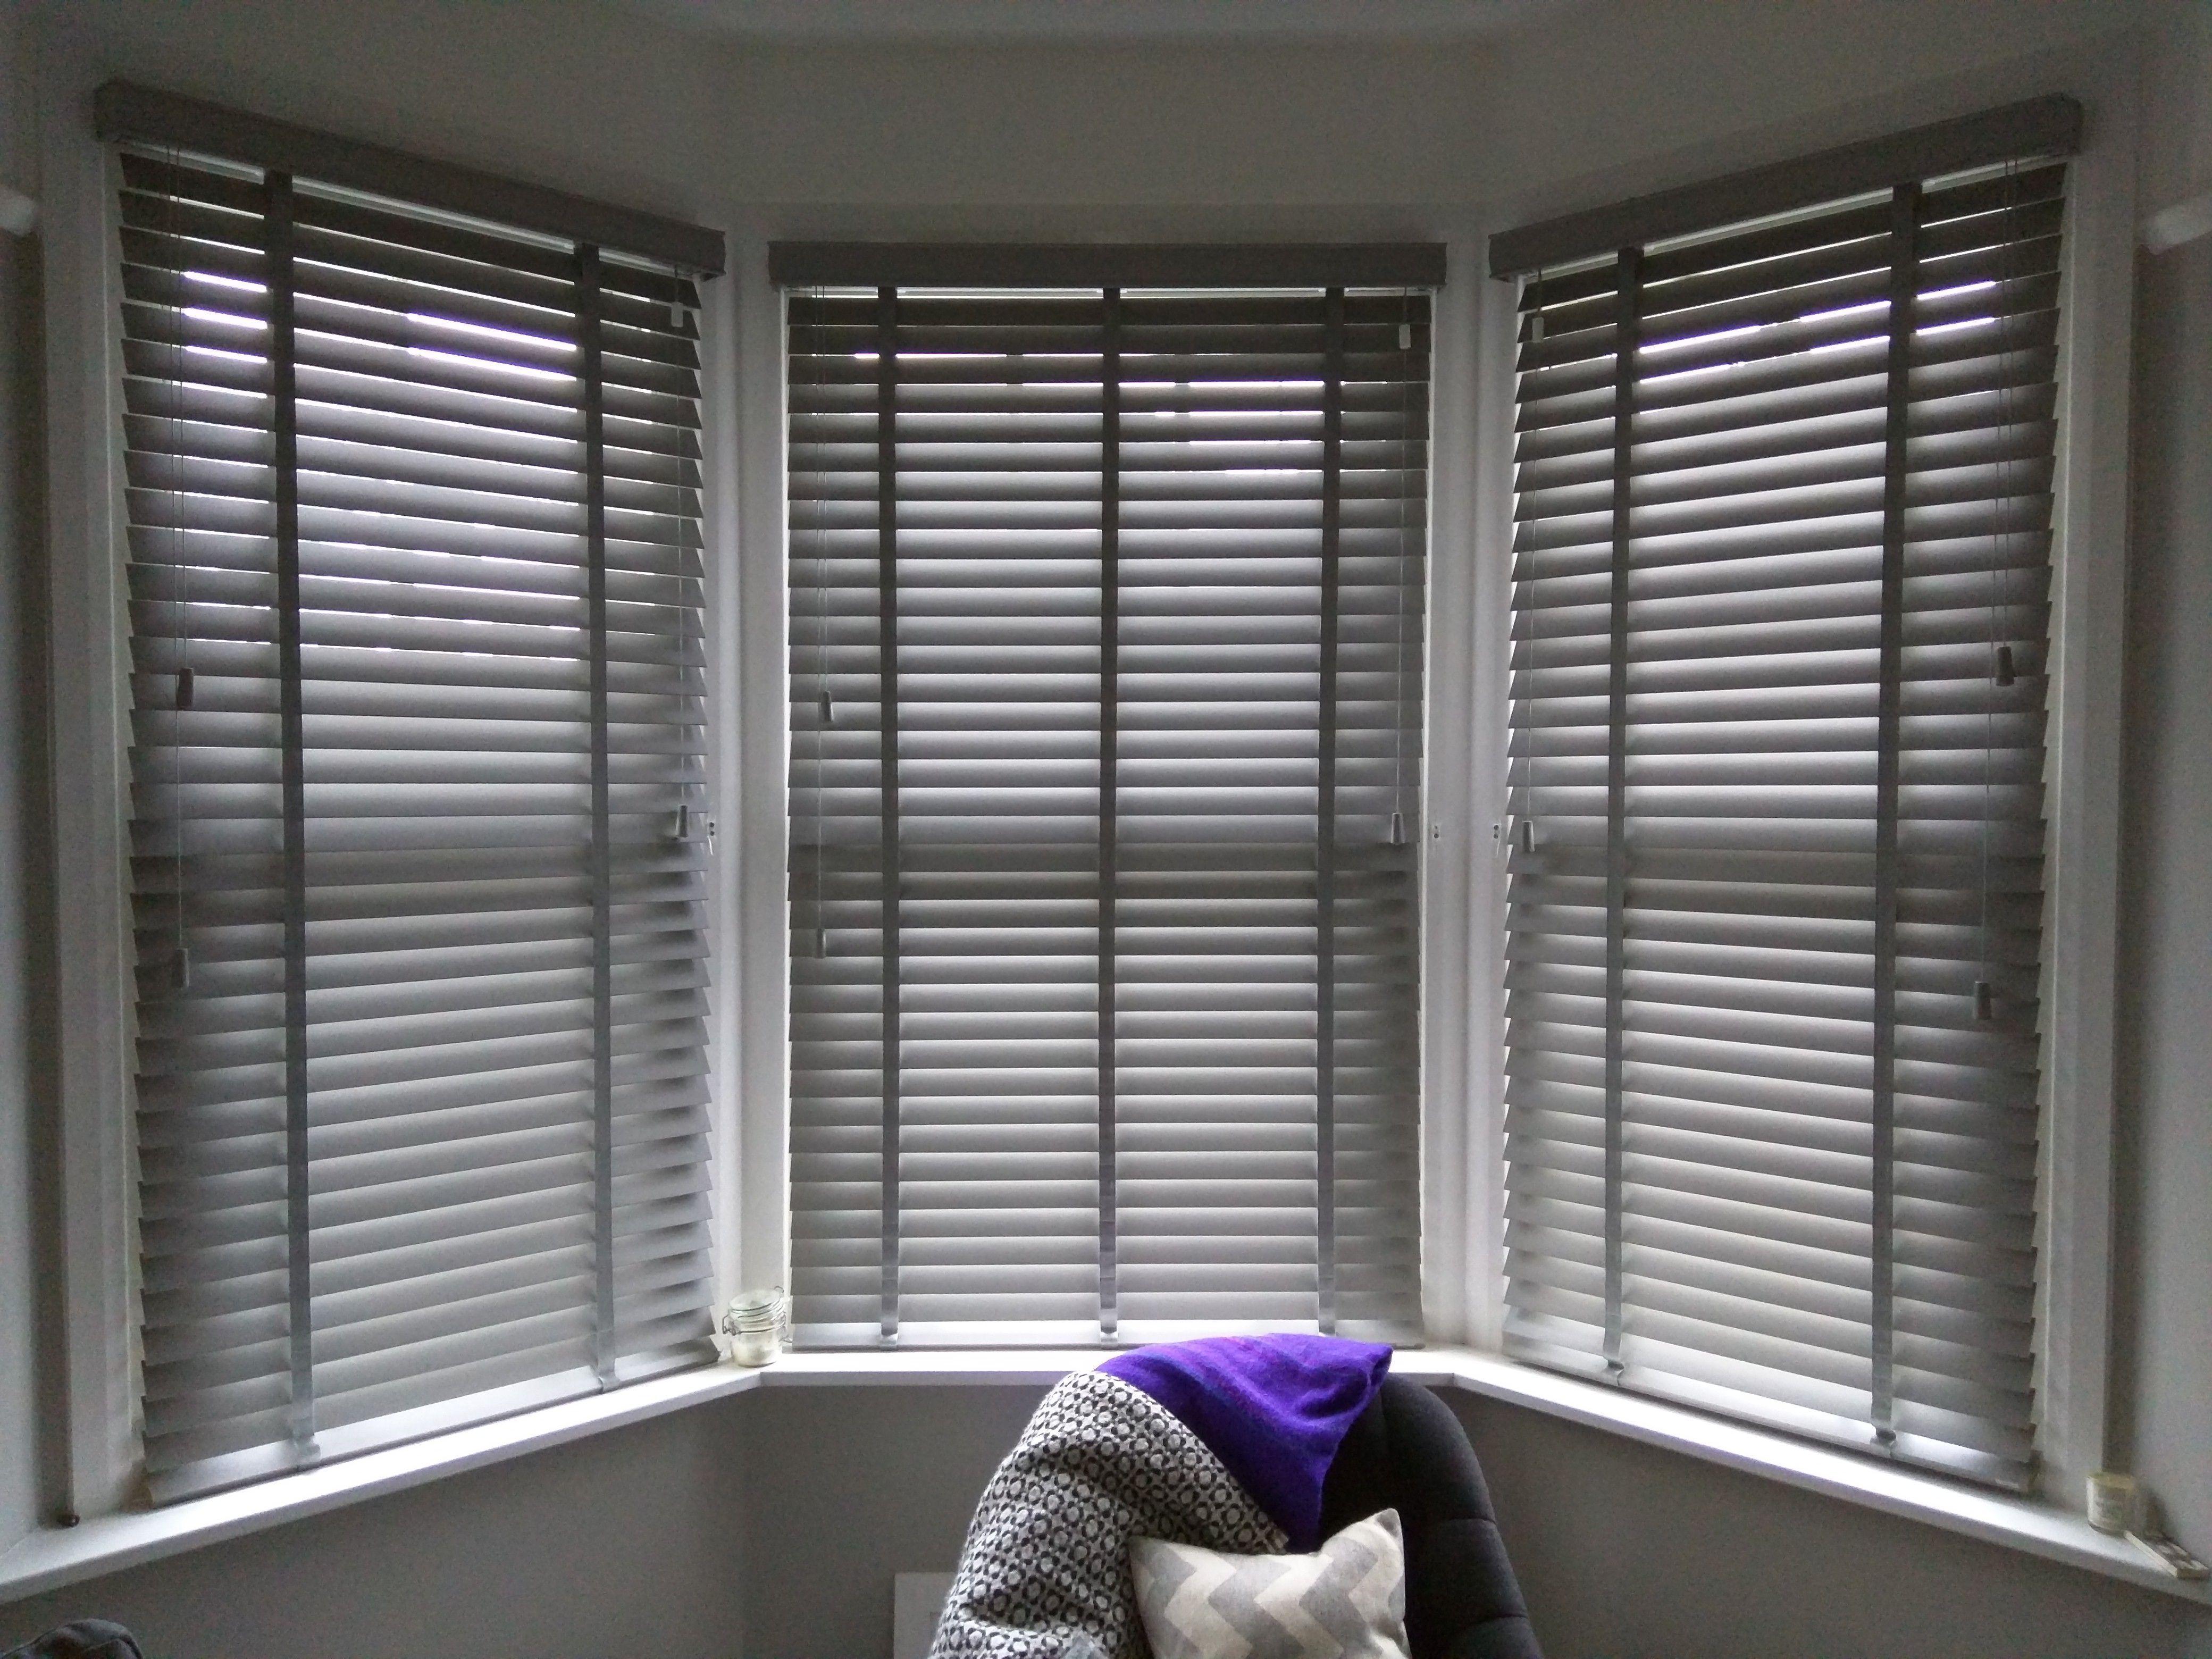 Estate Grey Wood Venetian Blinds Bay Window Blinds Brixton Made To Measure Bedroom Blinds Living Room B Wooden Blinds Blinds Design Bay Window Blinds